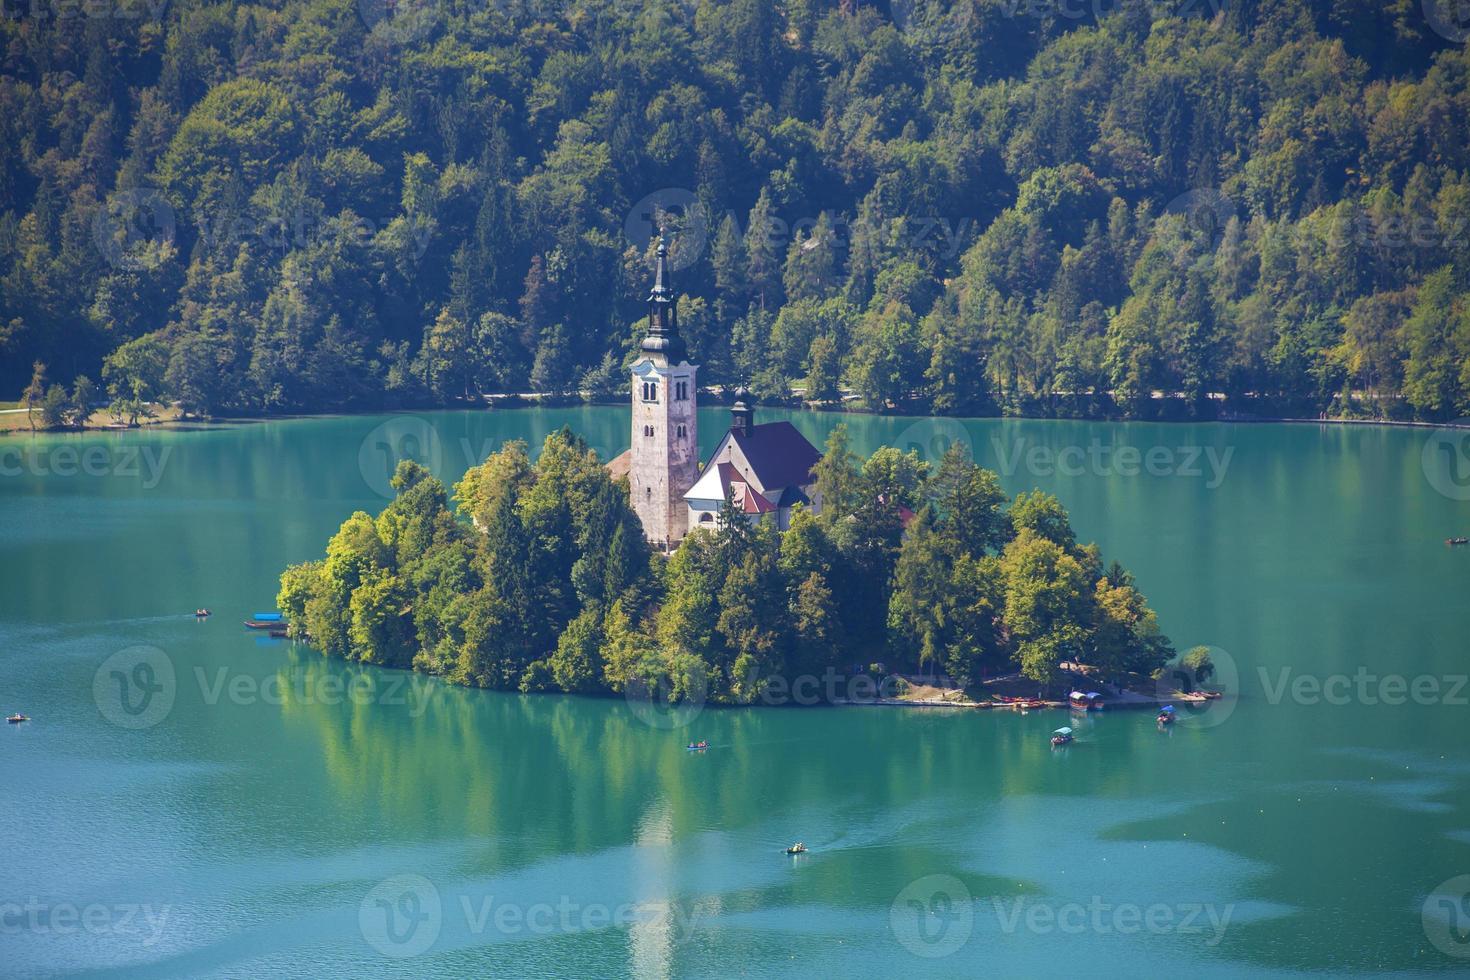 lago bled2 foto